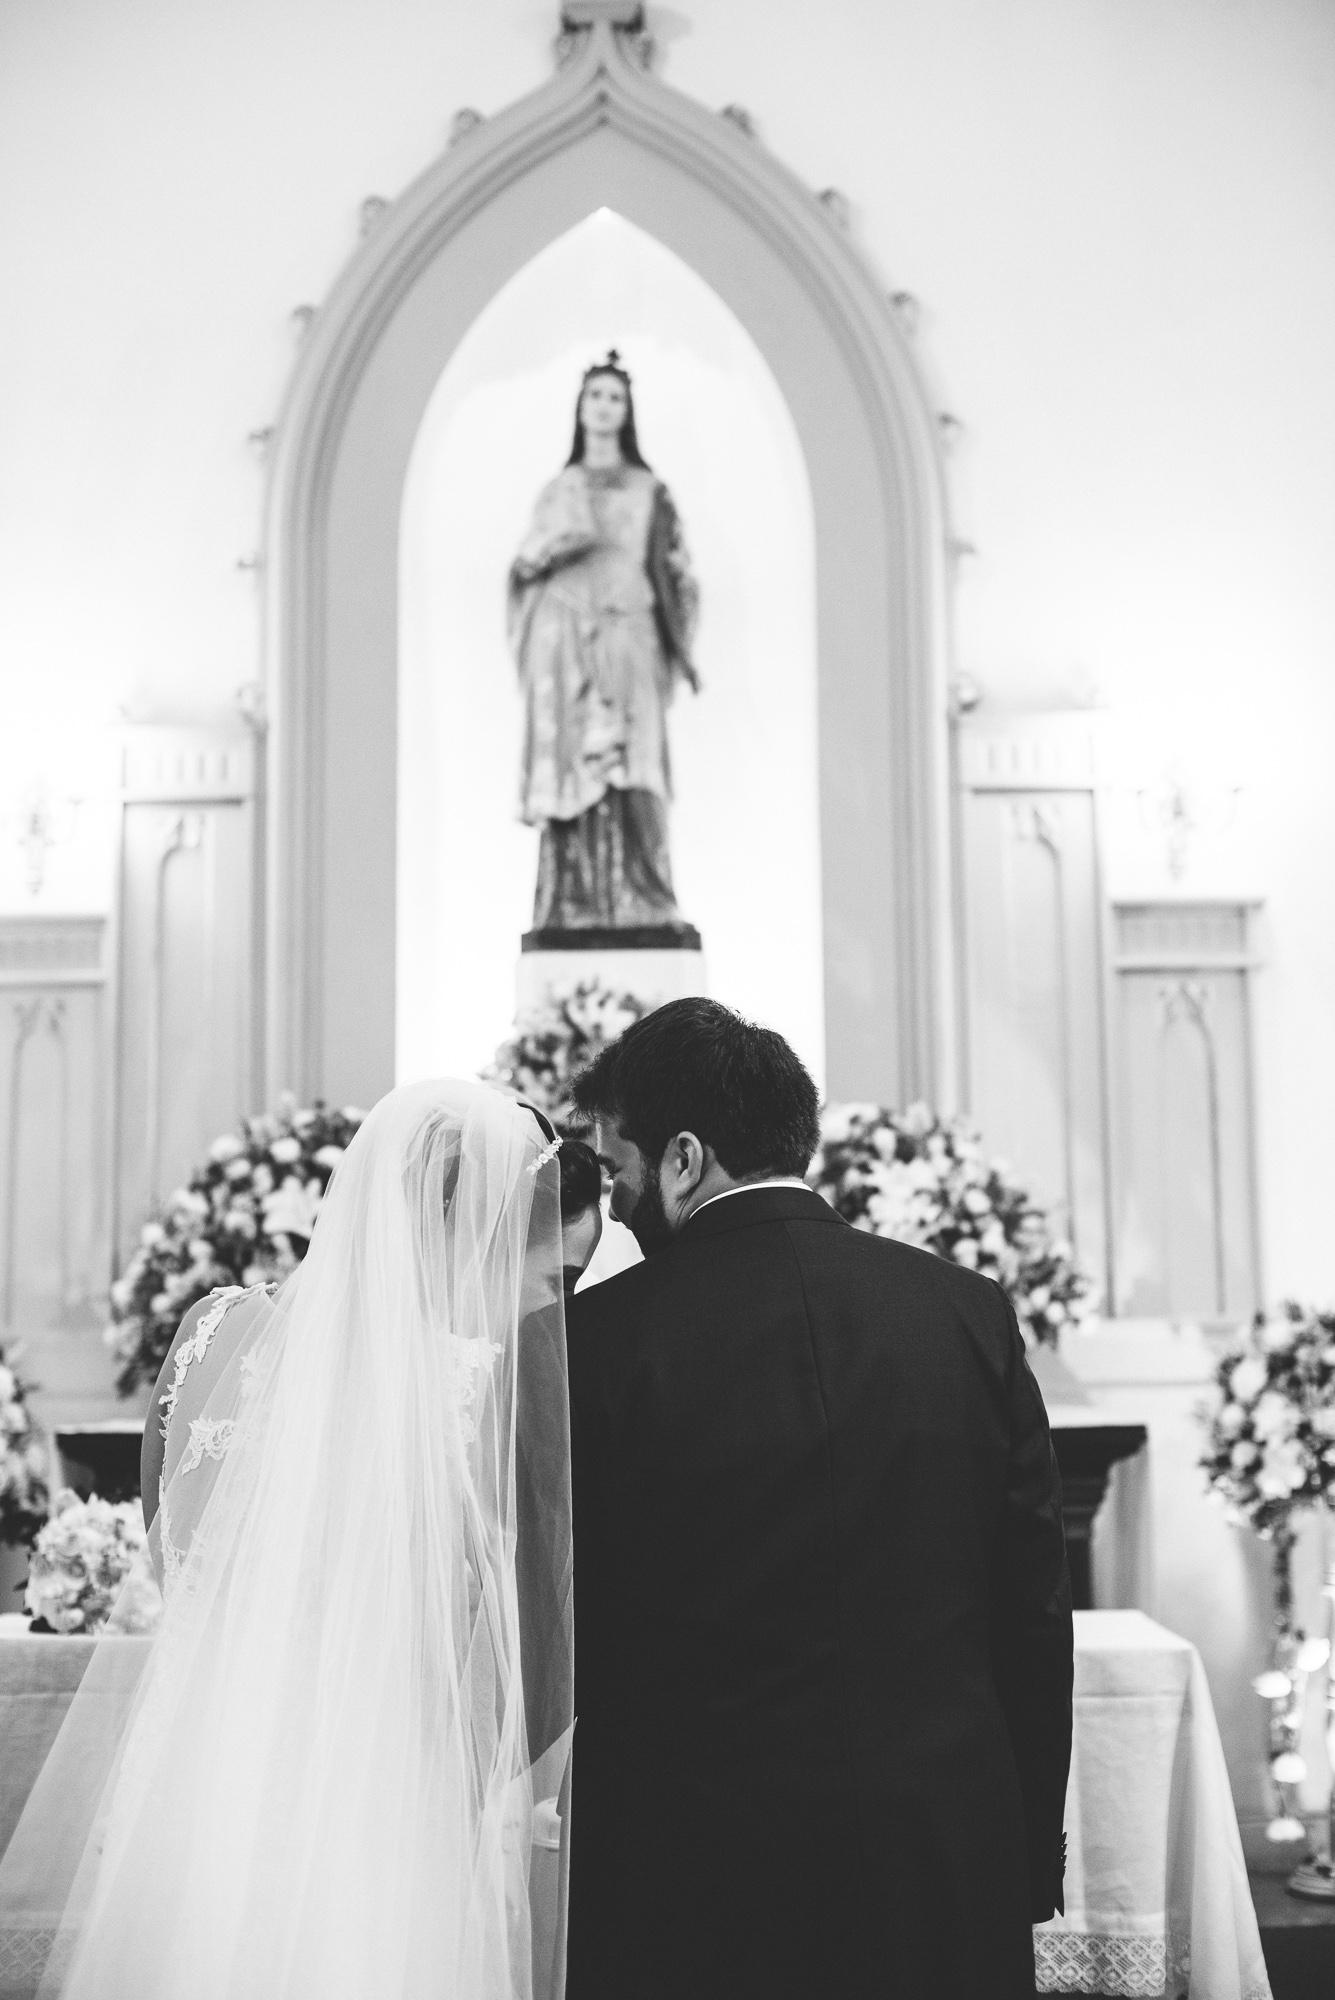 2015.04 Casamento Ana Paula Rendeiro e Rodrigo 0431